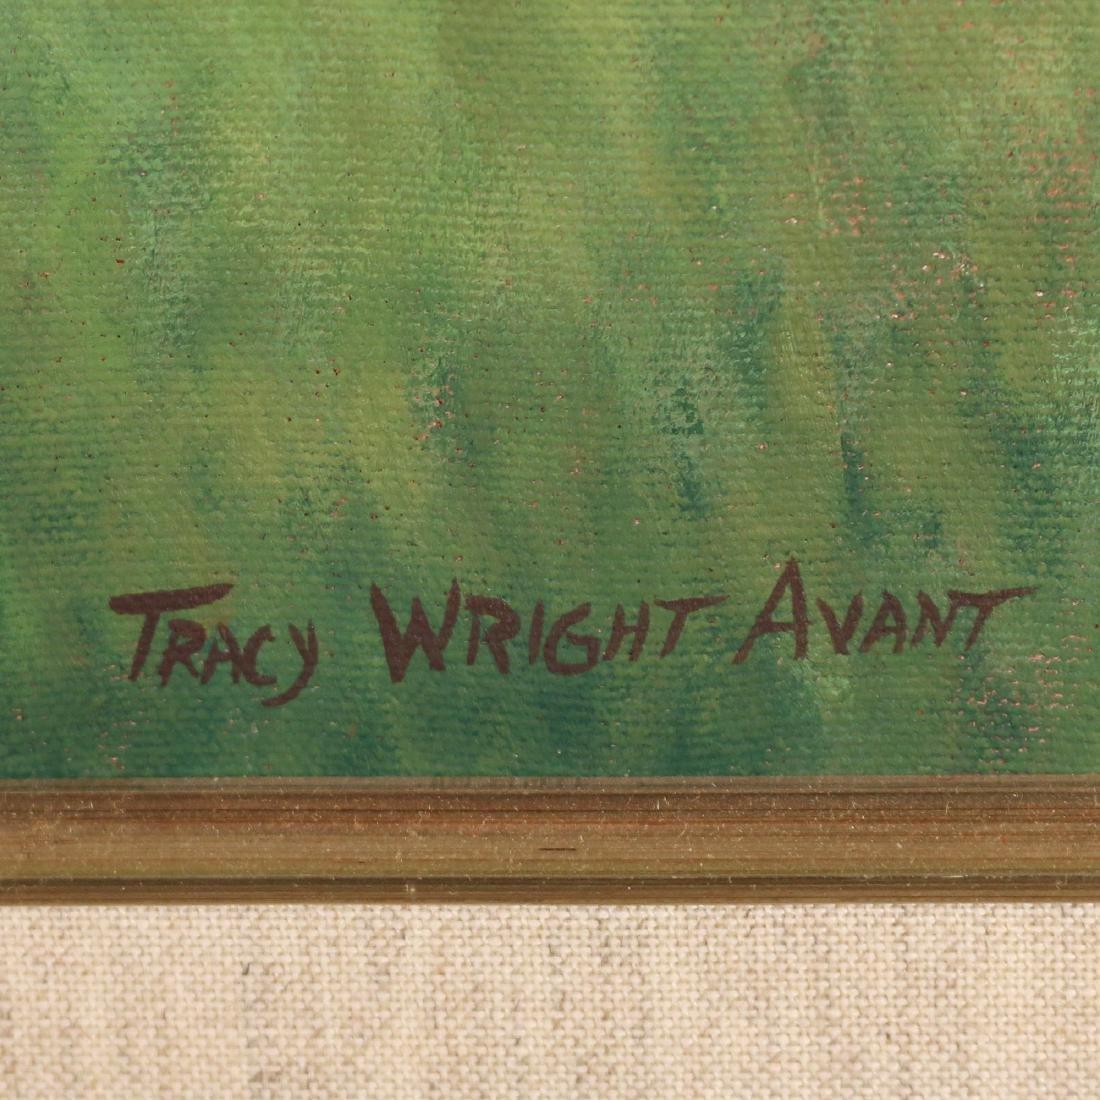 TRACY WRIGHT AVANT (American, b. 1960) - 3